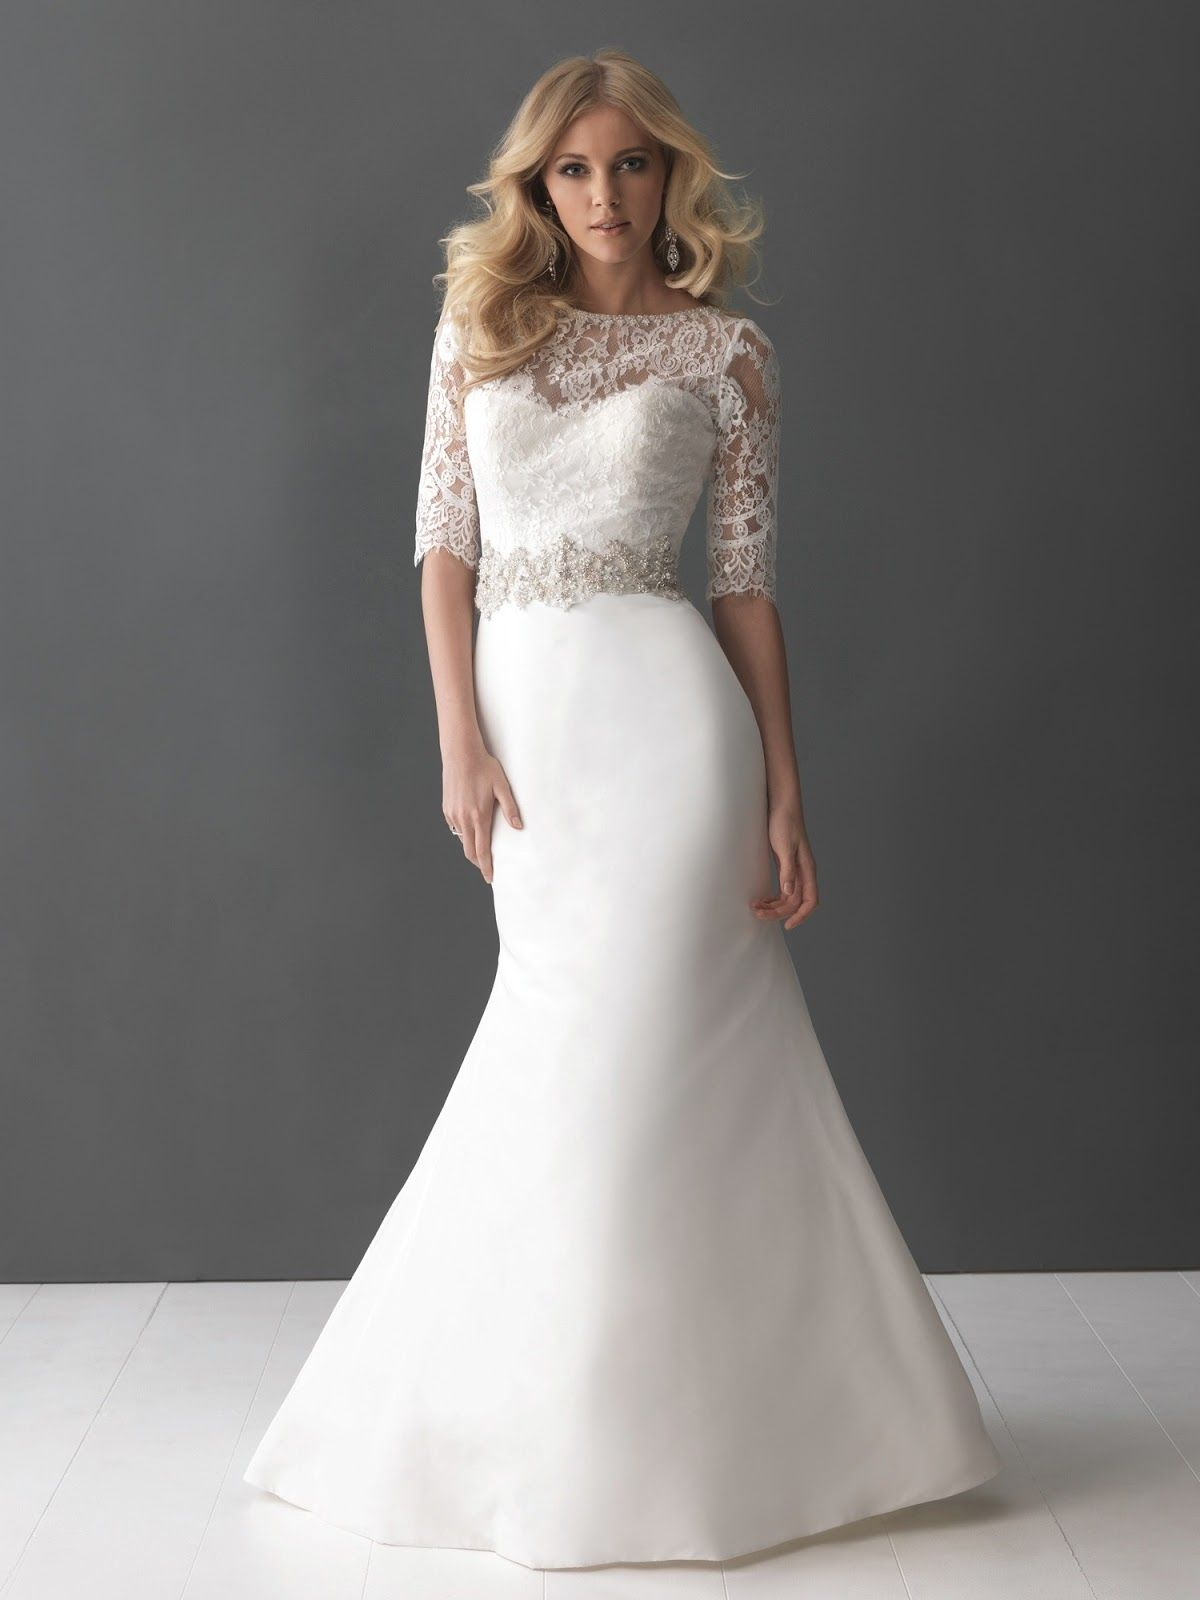 best wedding dress styles for short curvy brides